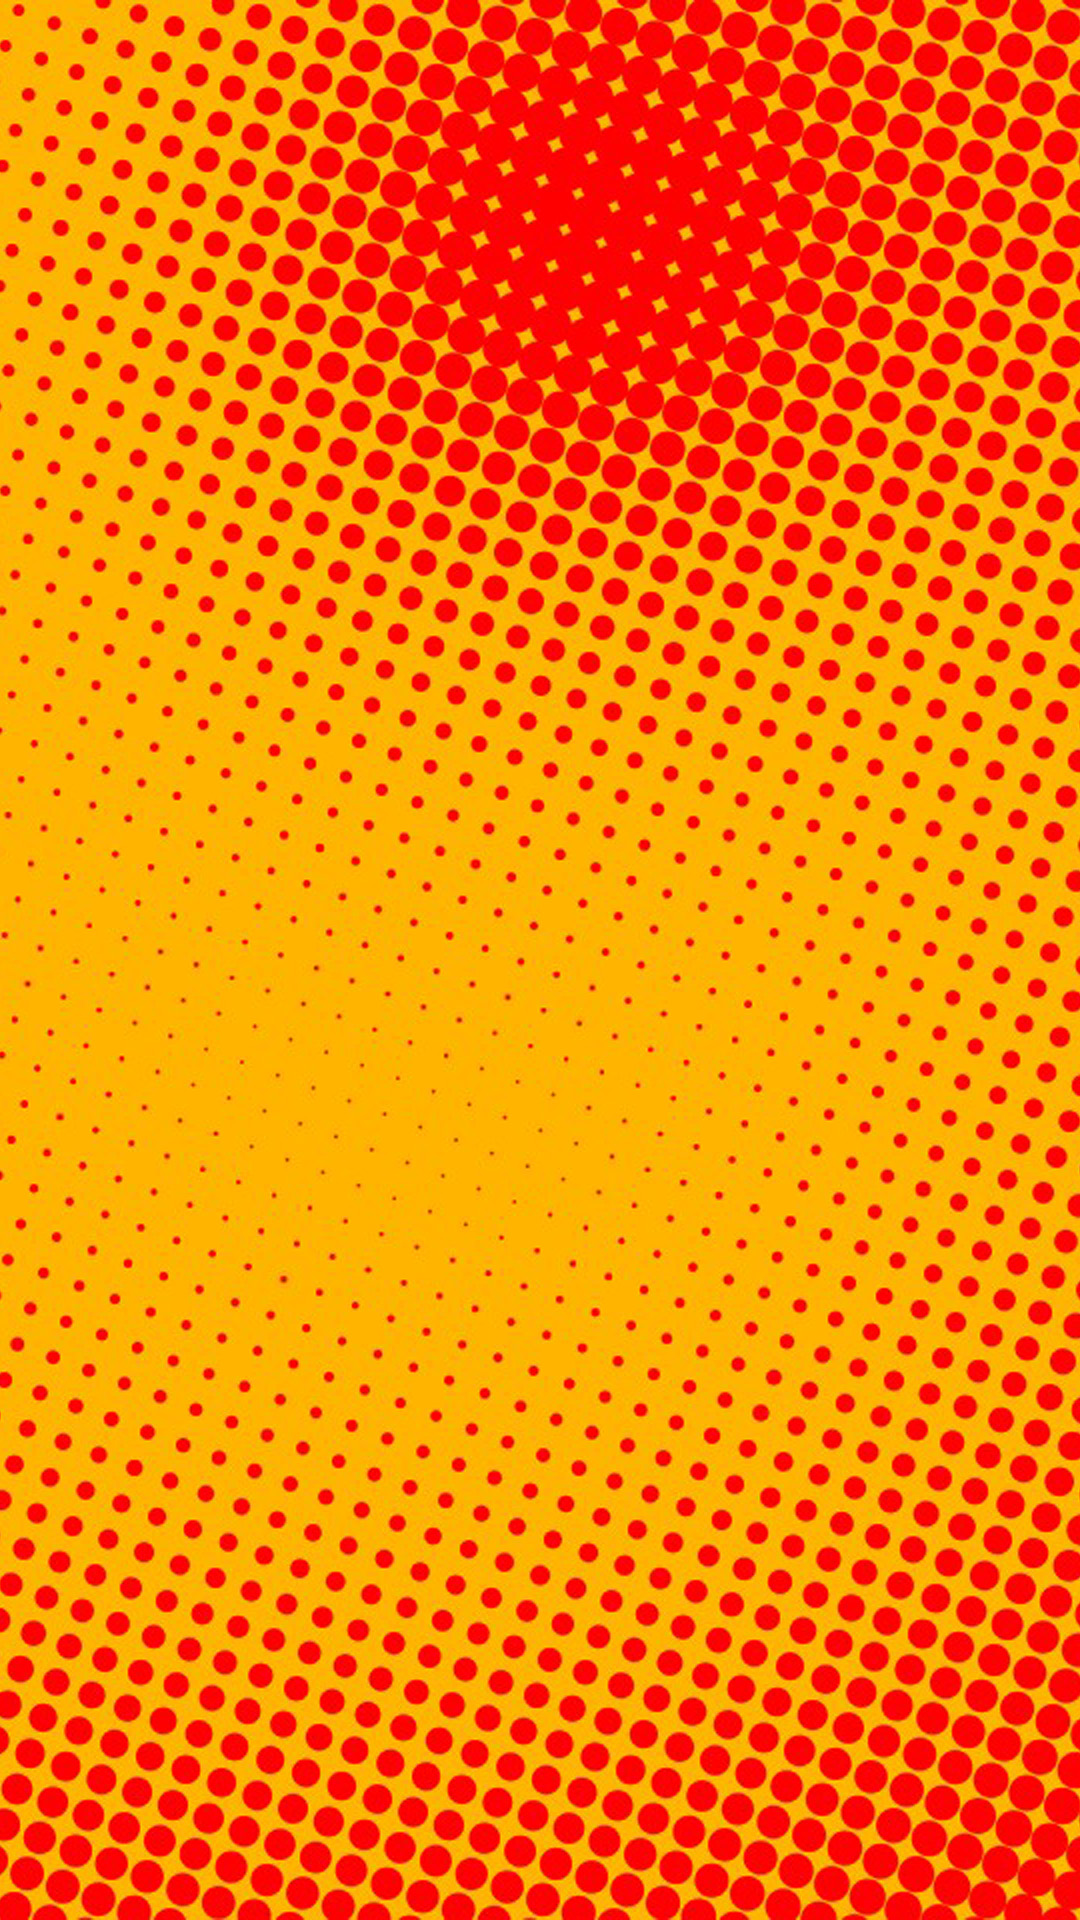 Background dots orange hd wallpaper iphone 6 plus for Orange wallpaper